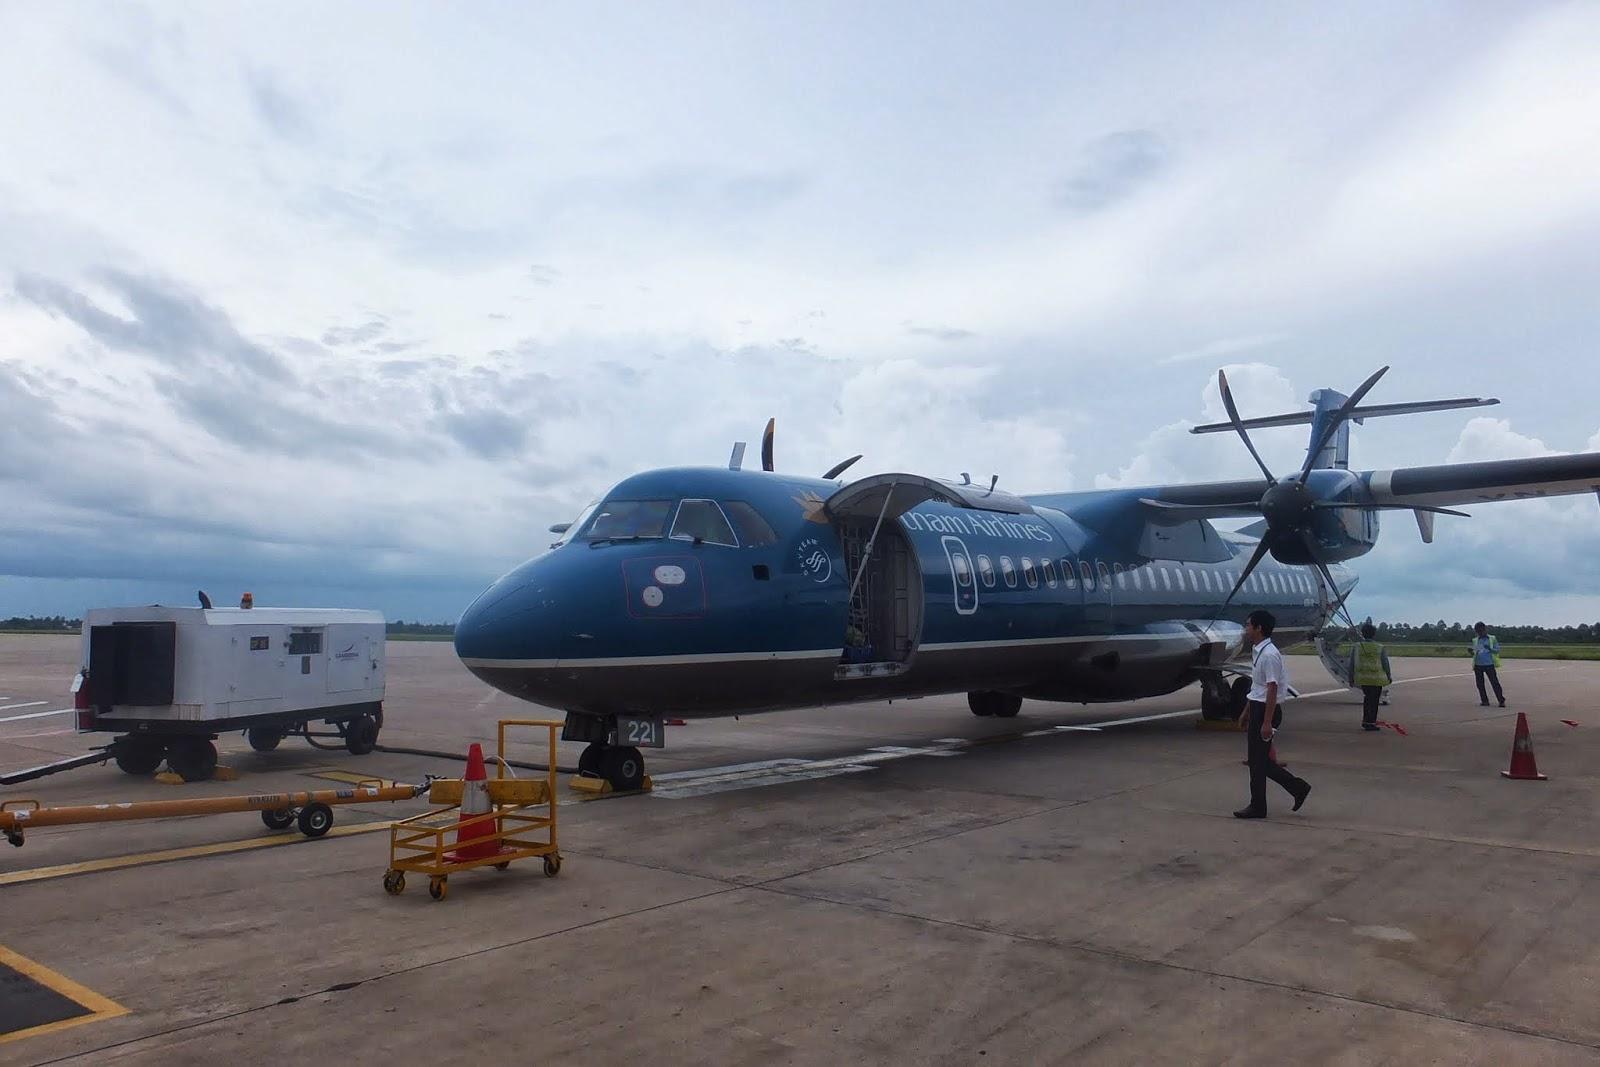 ATR72-vietnamair-incambodia ベトナム航空のプロペラ機